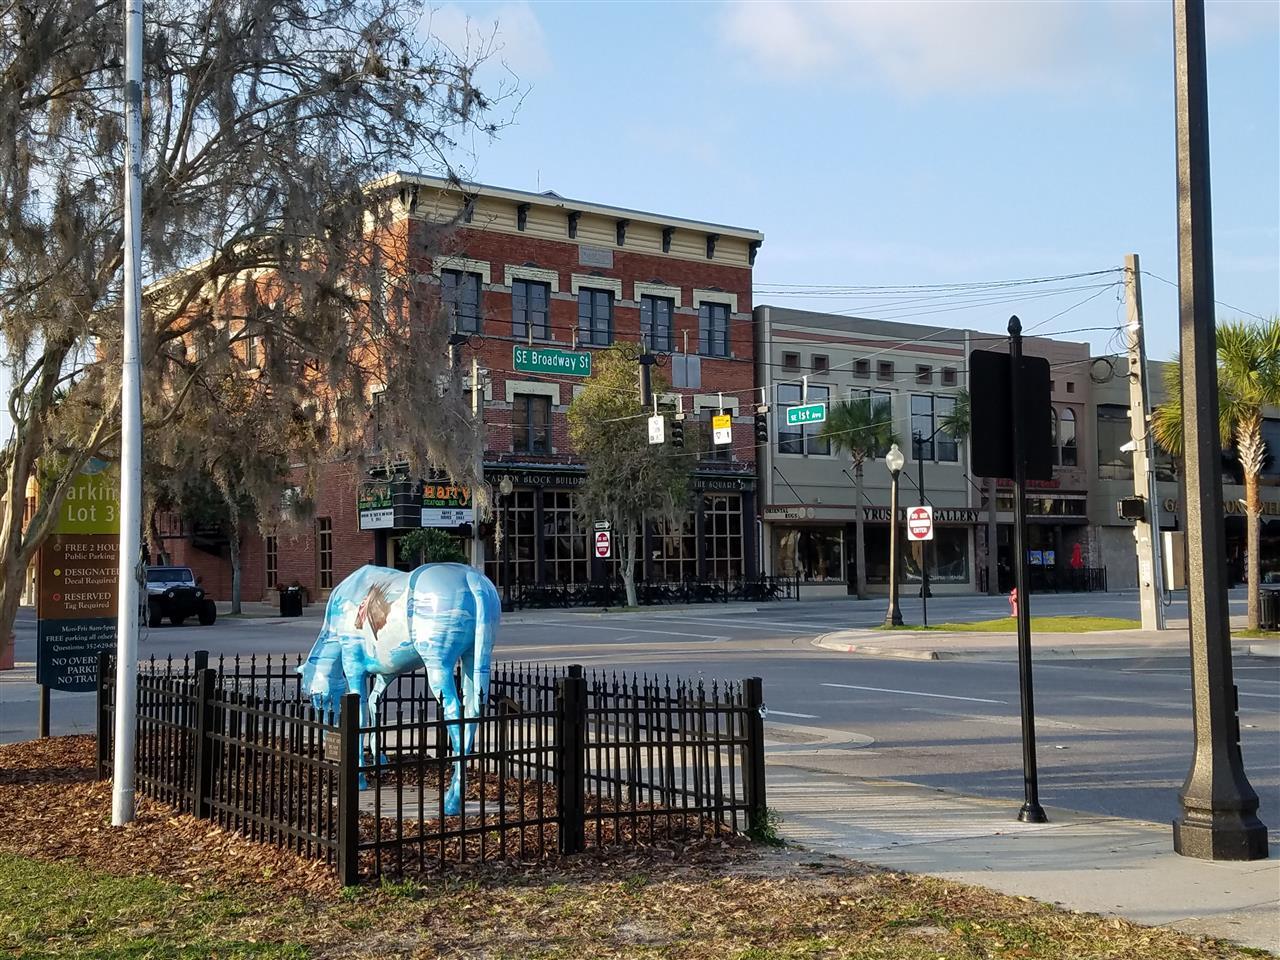 SE Broadway St and SE 1st Avenue, Ocala, Florida